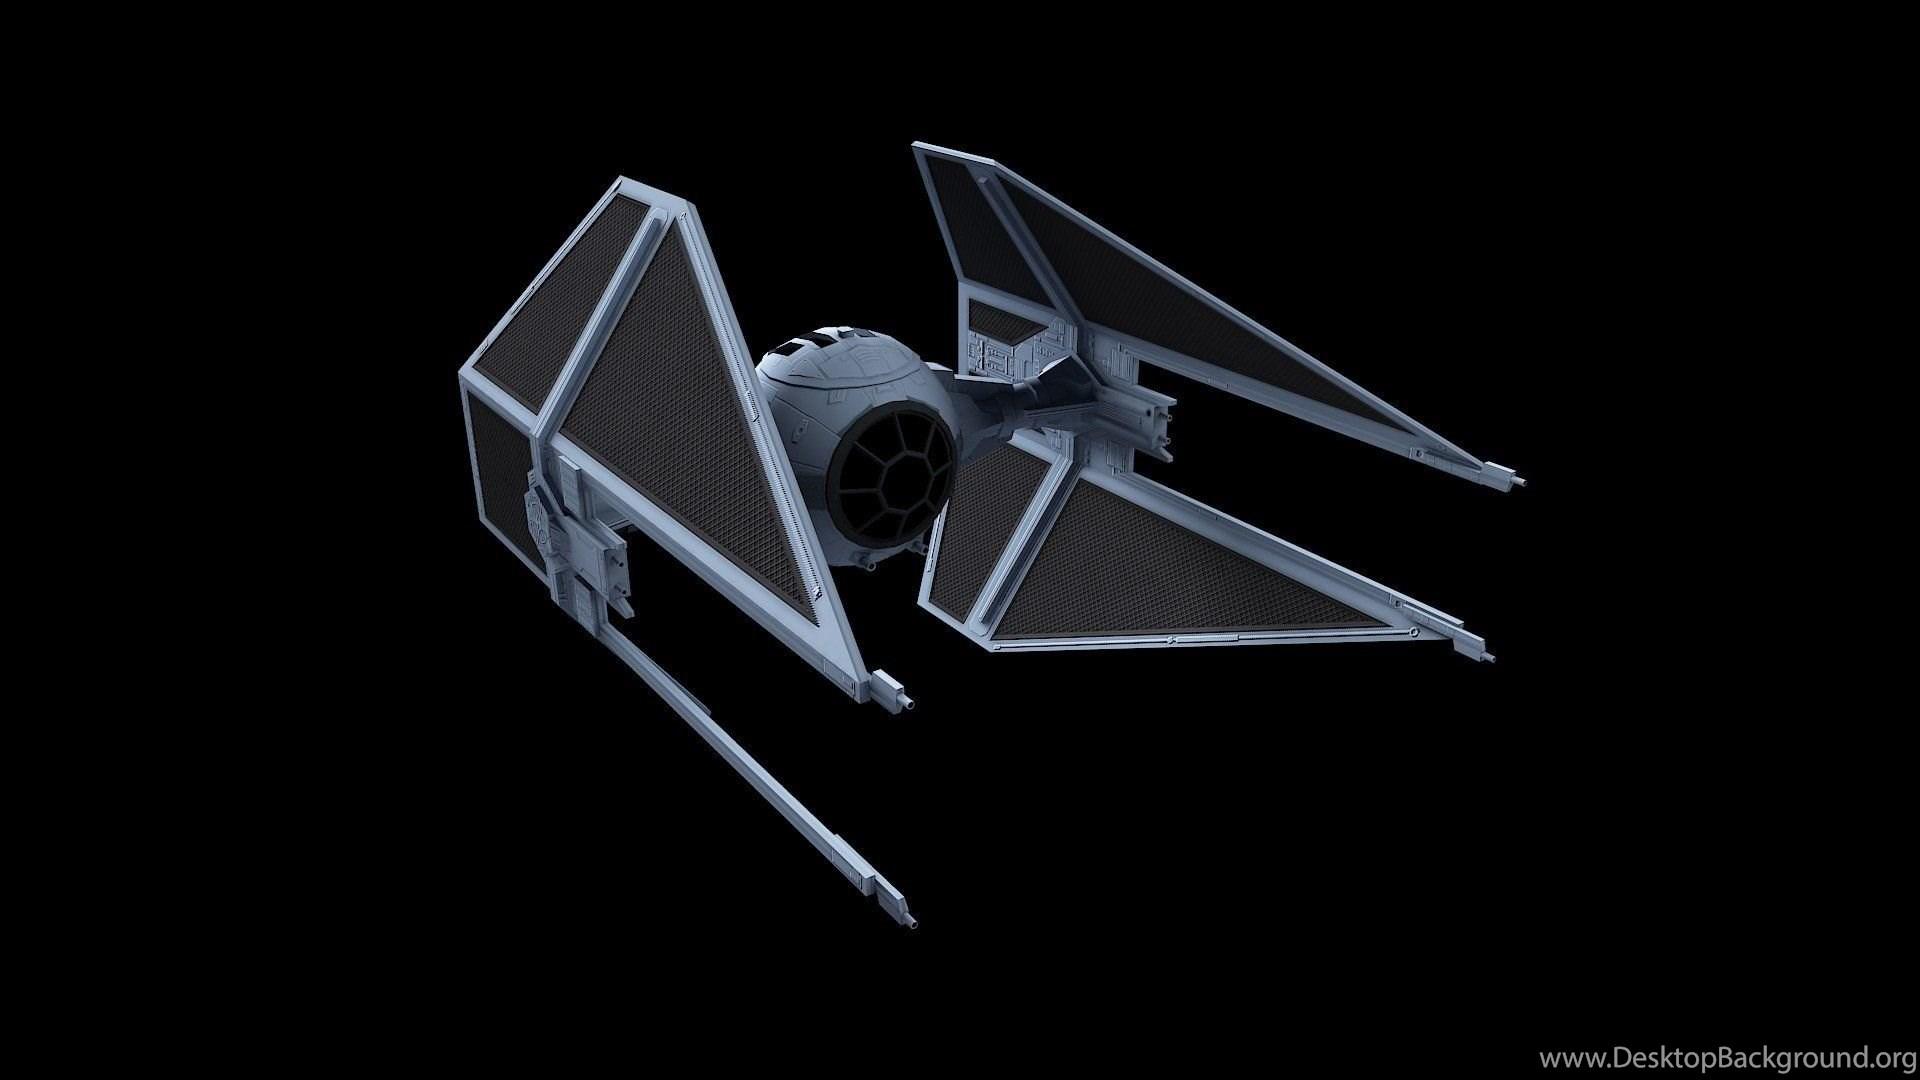 Tie Fighter Star Wars Futuristic Spaceship Space Sci Fi Wallpapers Desktop Background